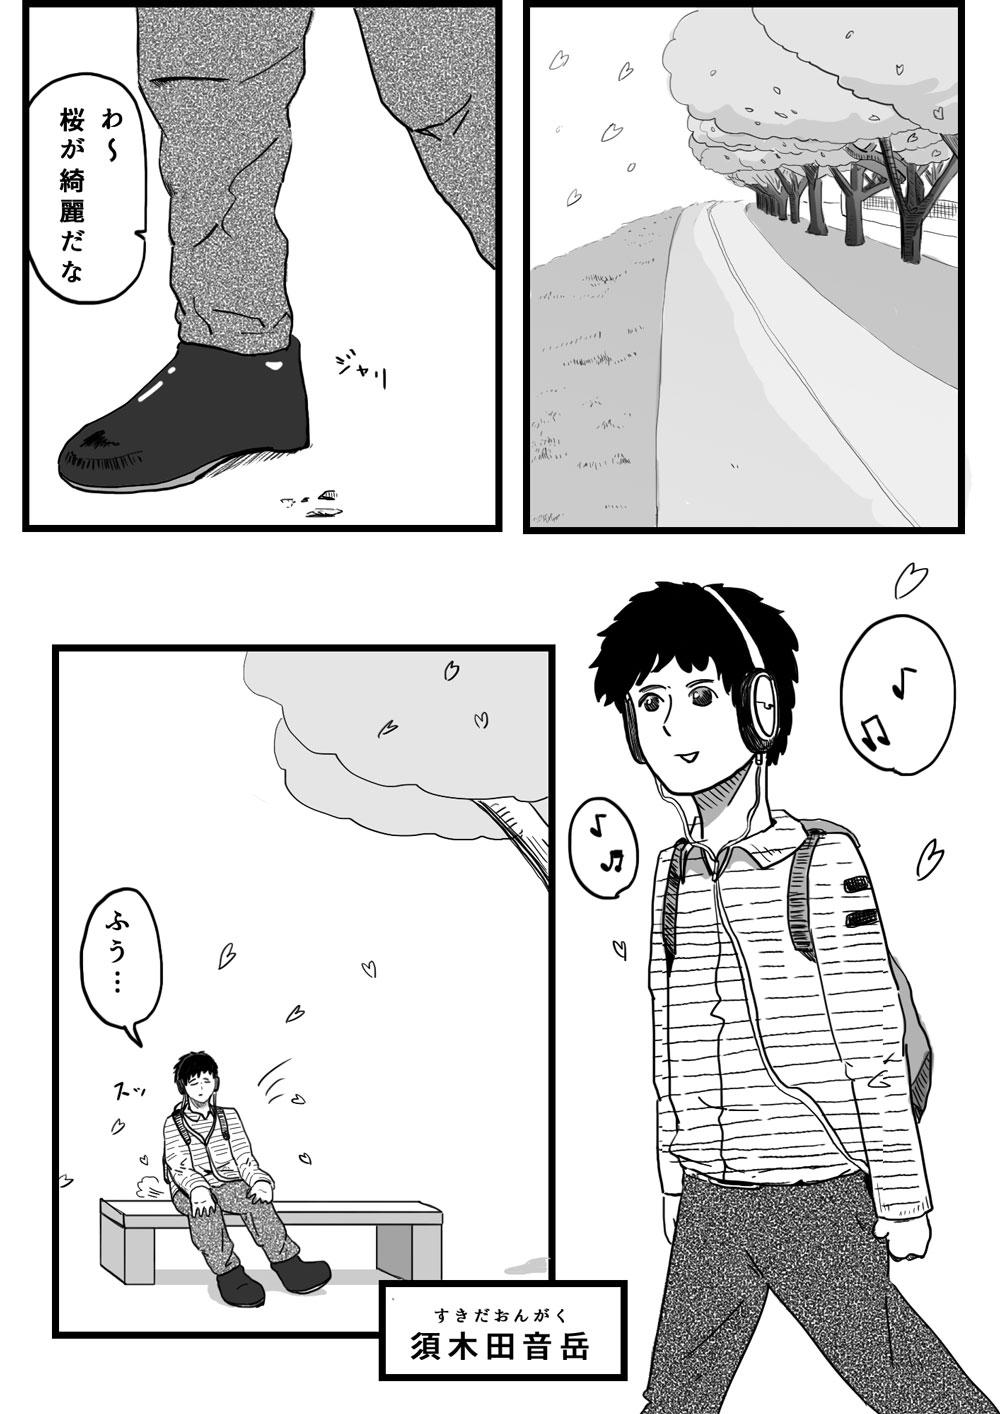 arnolds-hasegawa-001-1